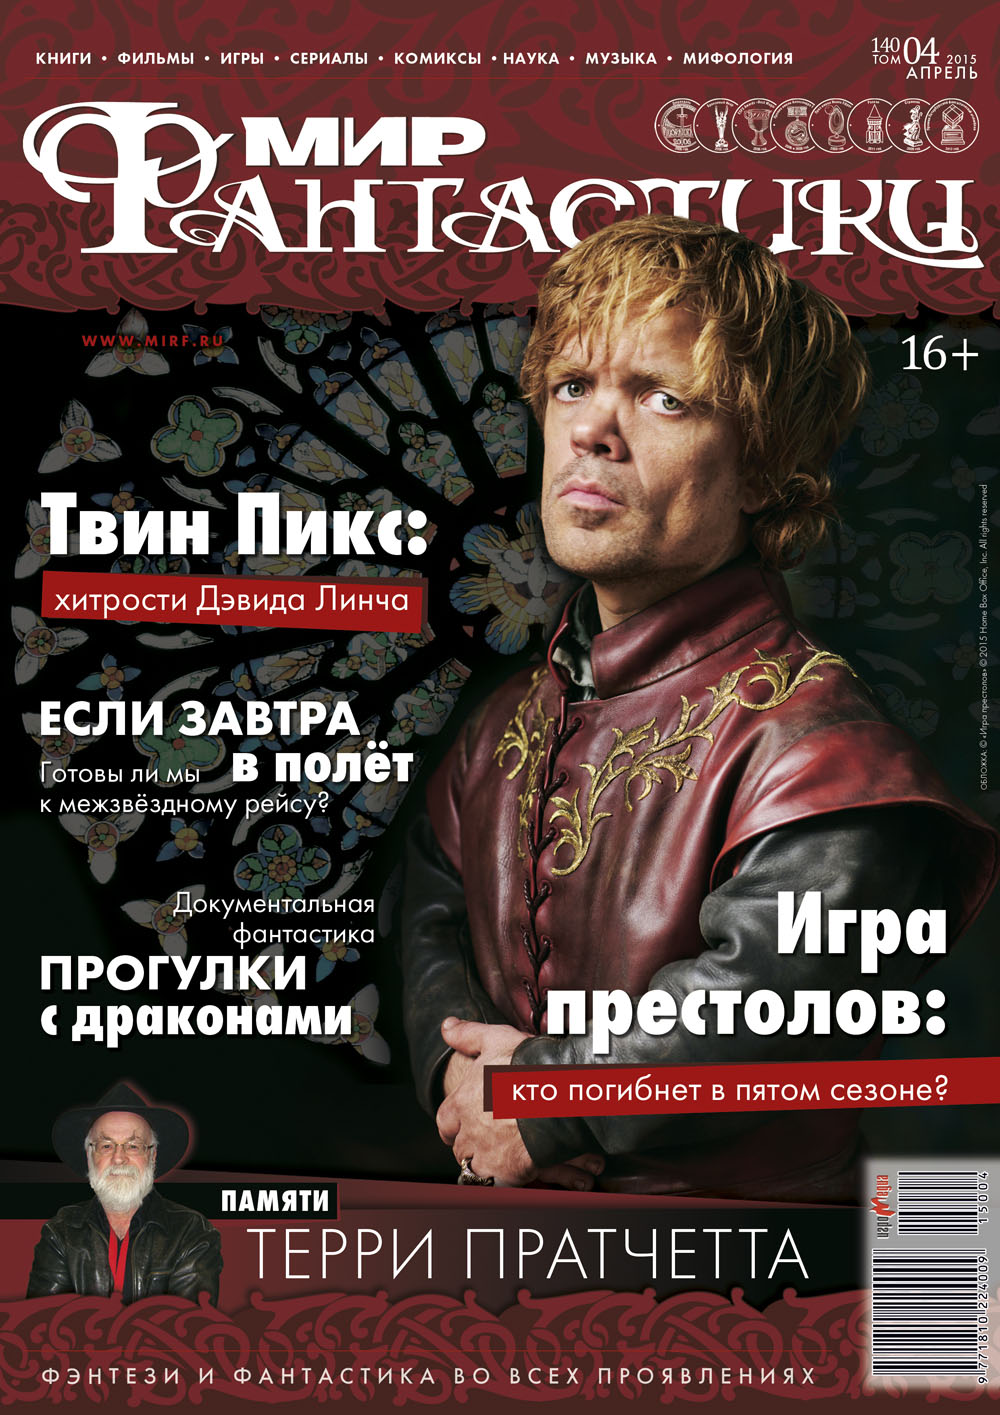 Мир фантастики №140. Апрель 2015